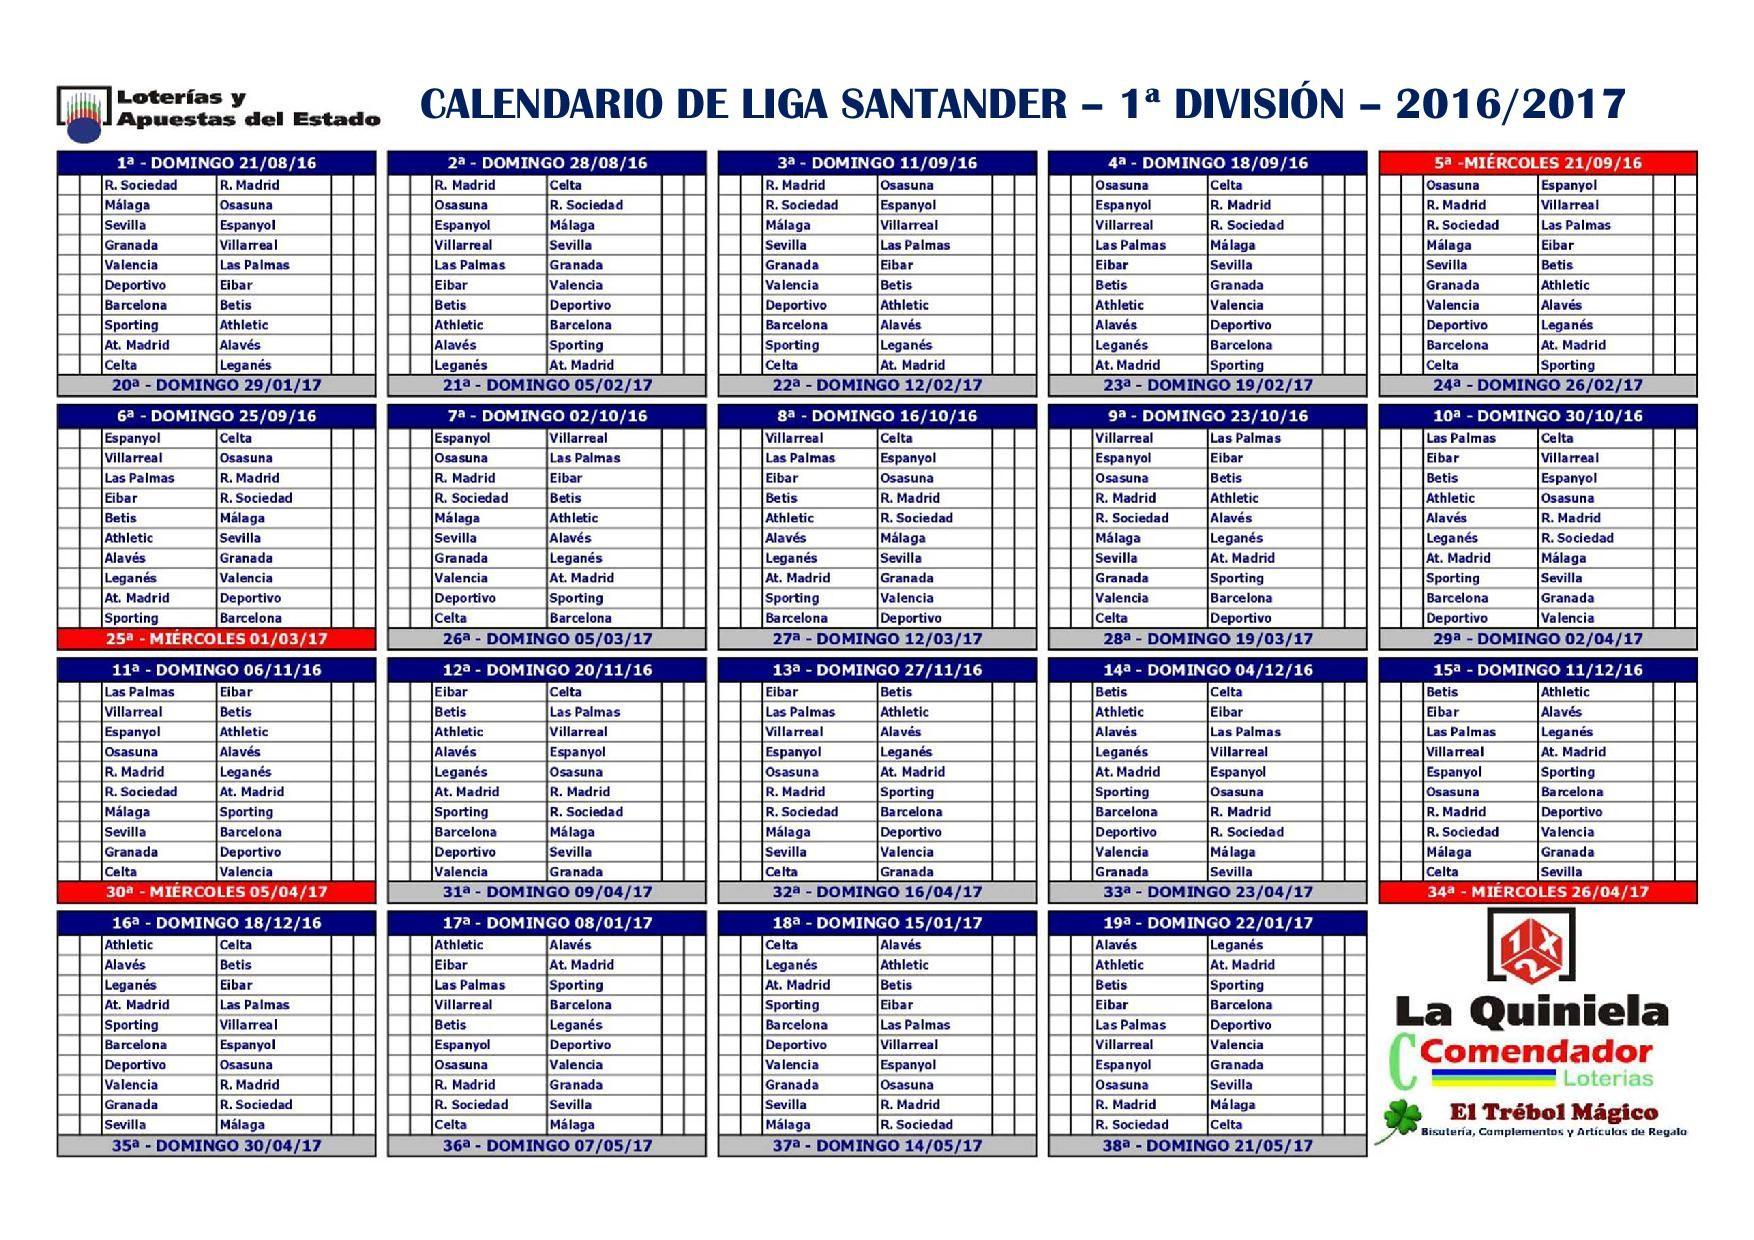 calendario liga santander 2017 4